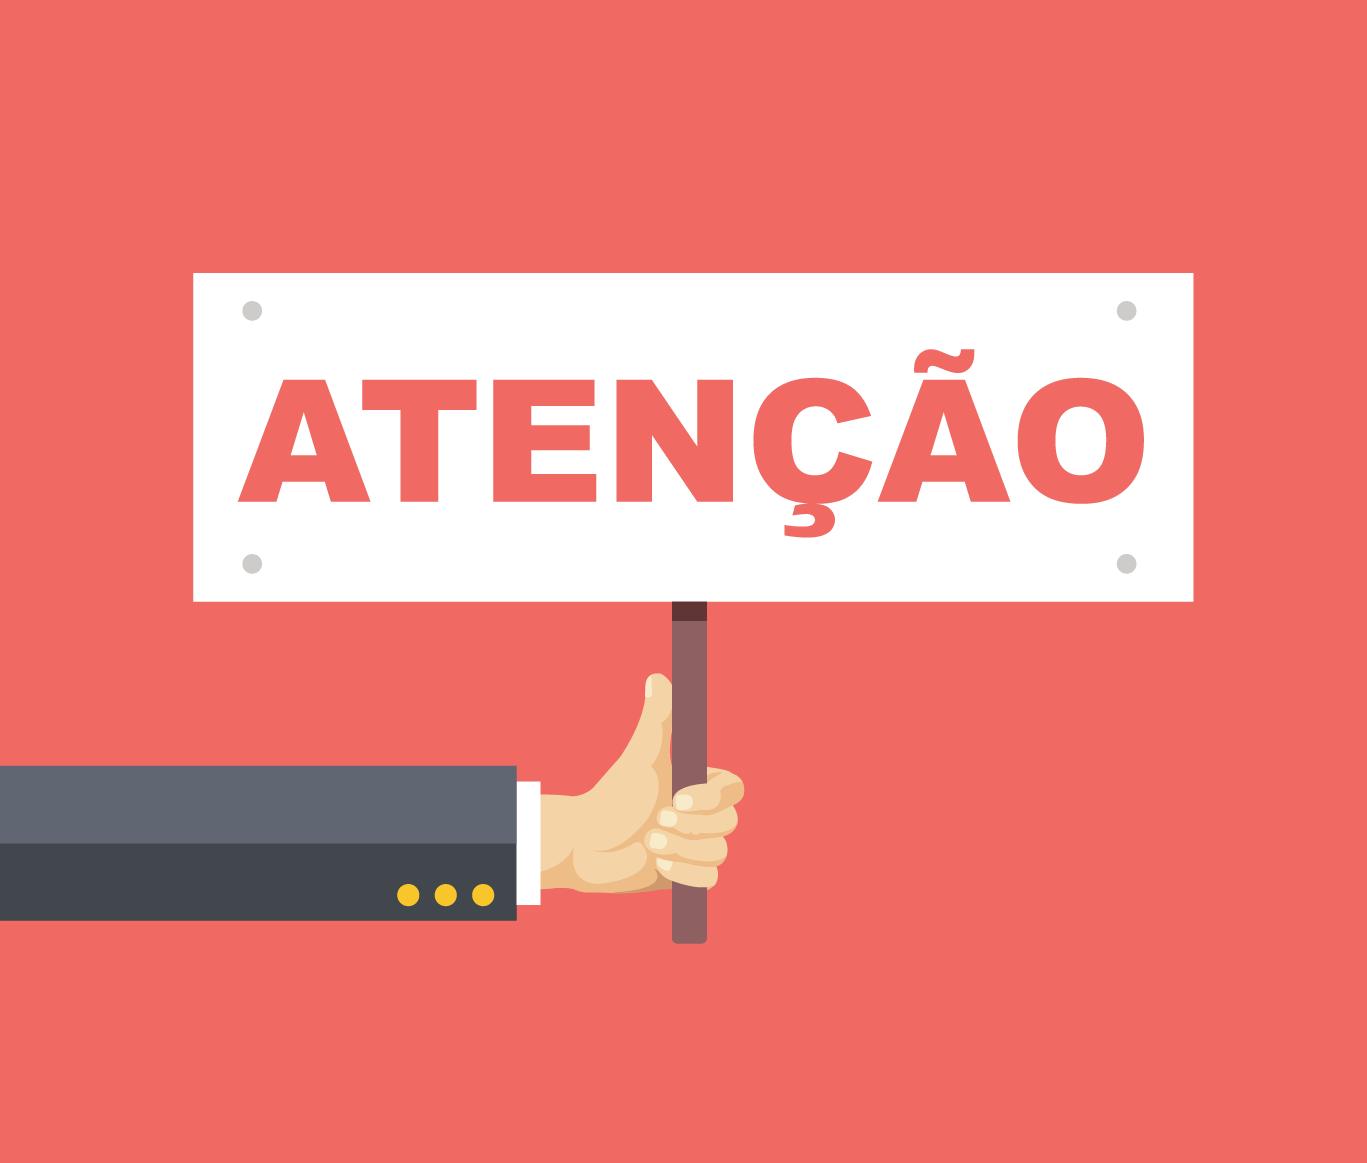 http://colegioadelia.com.br/wp-content/uploads/2018/01/aten%C3%A7%C3%A3o.png